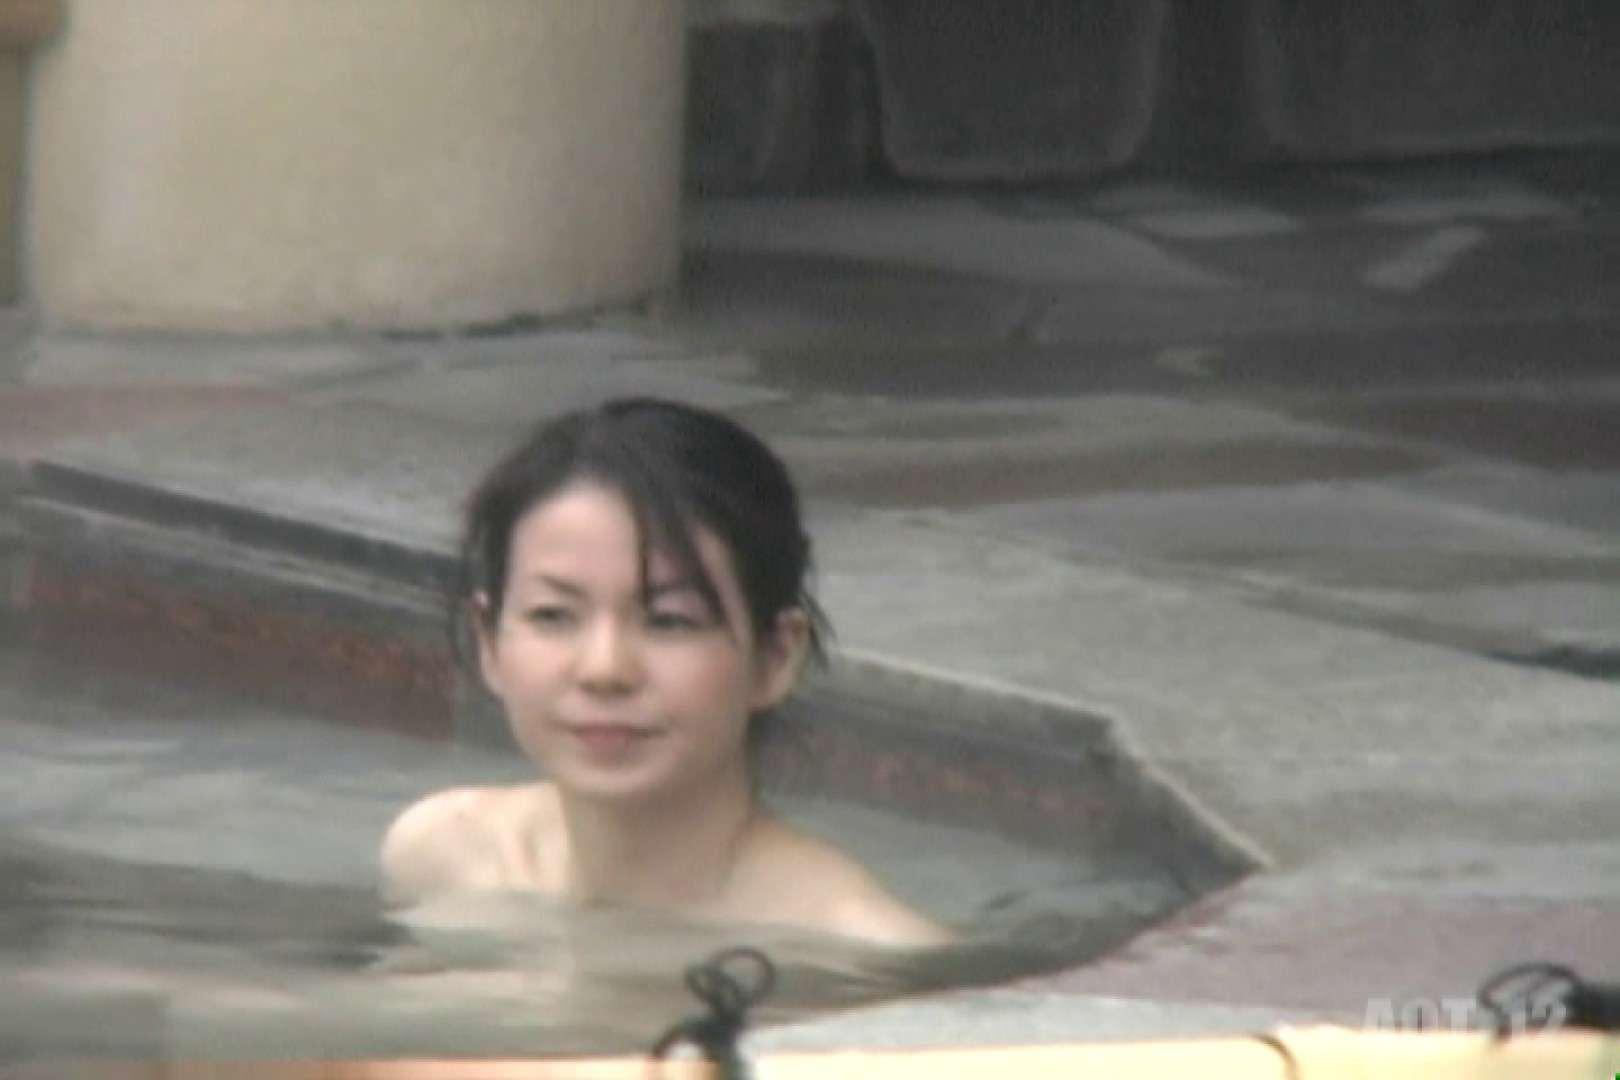 Aquaな露天風呂Vol.811 露天 | OLのプライベート  11pic 1